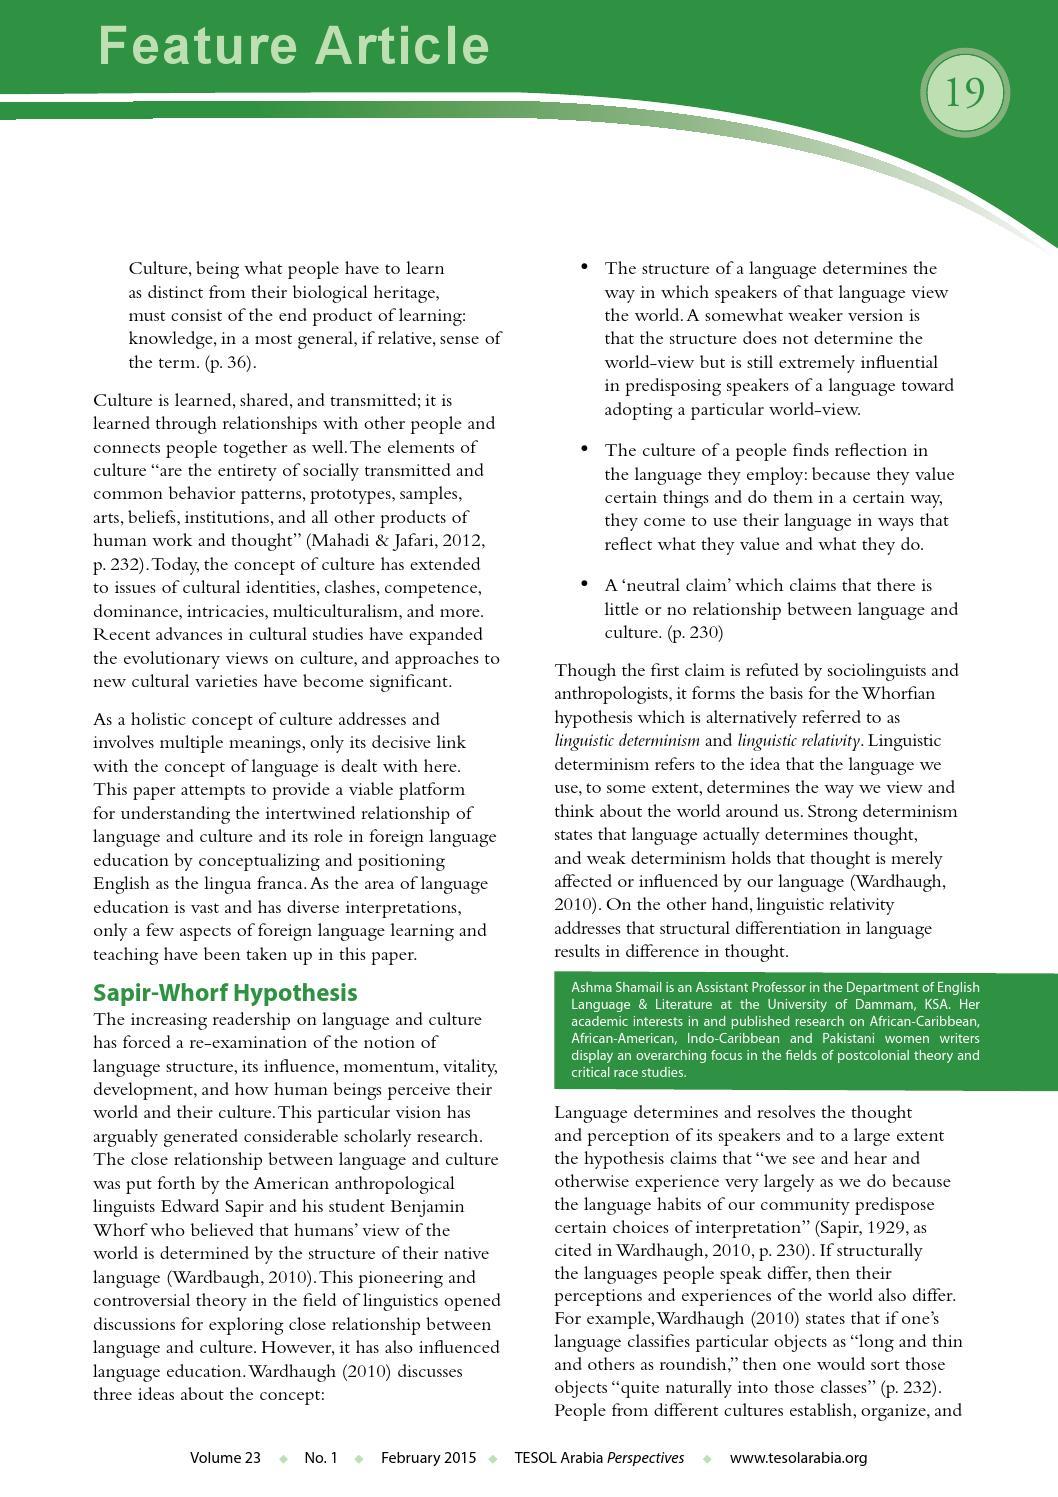 FEB By TESOL Arabia Perspectives Issuu - World no 1 language